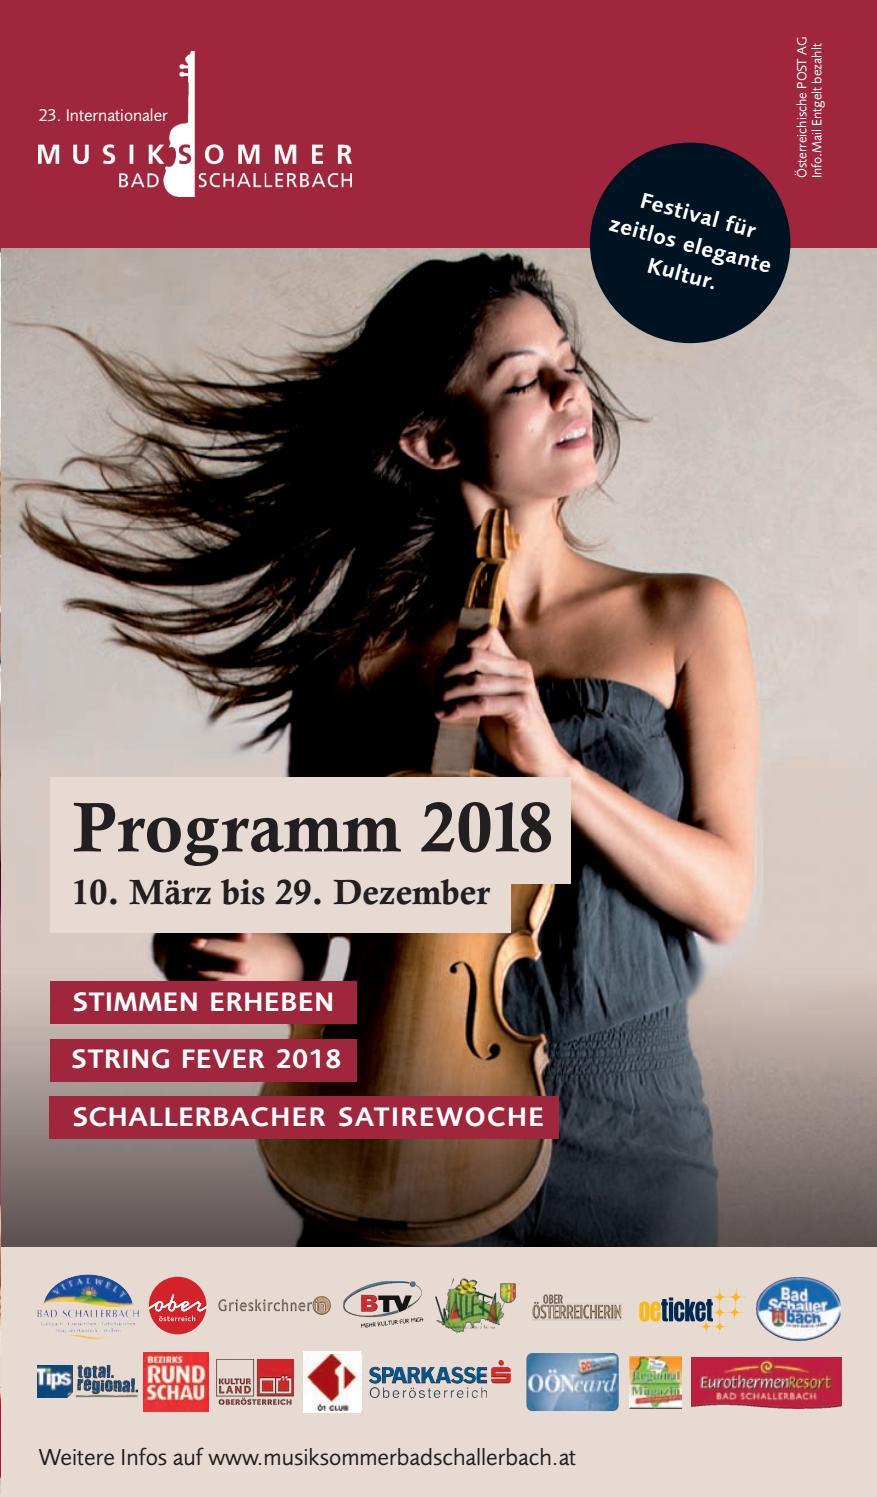 Musiksommer 2018 Programm By Tourismusverband Vitalwelt Issuu